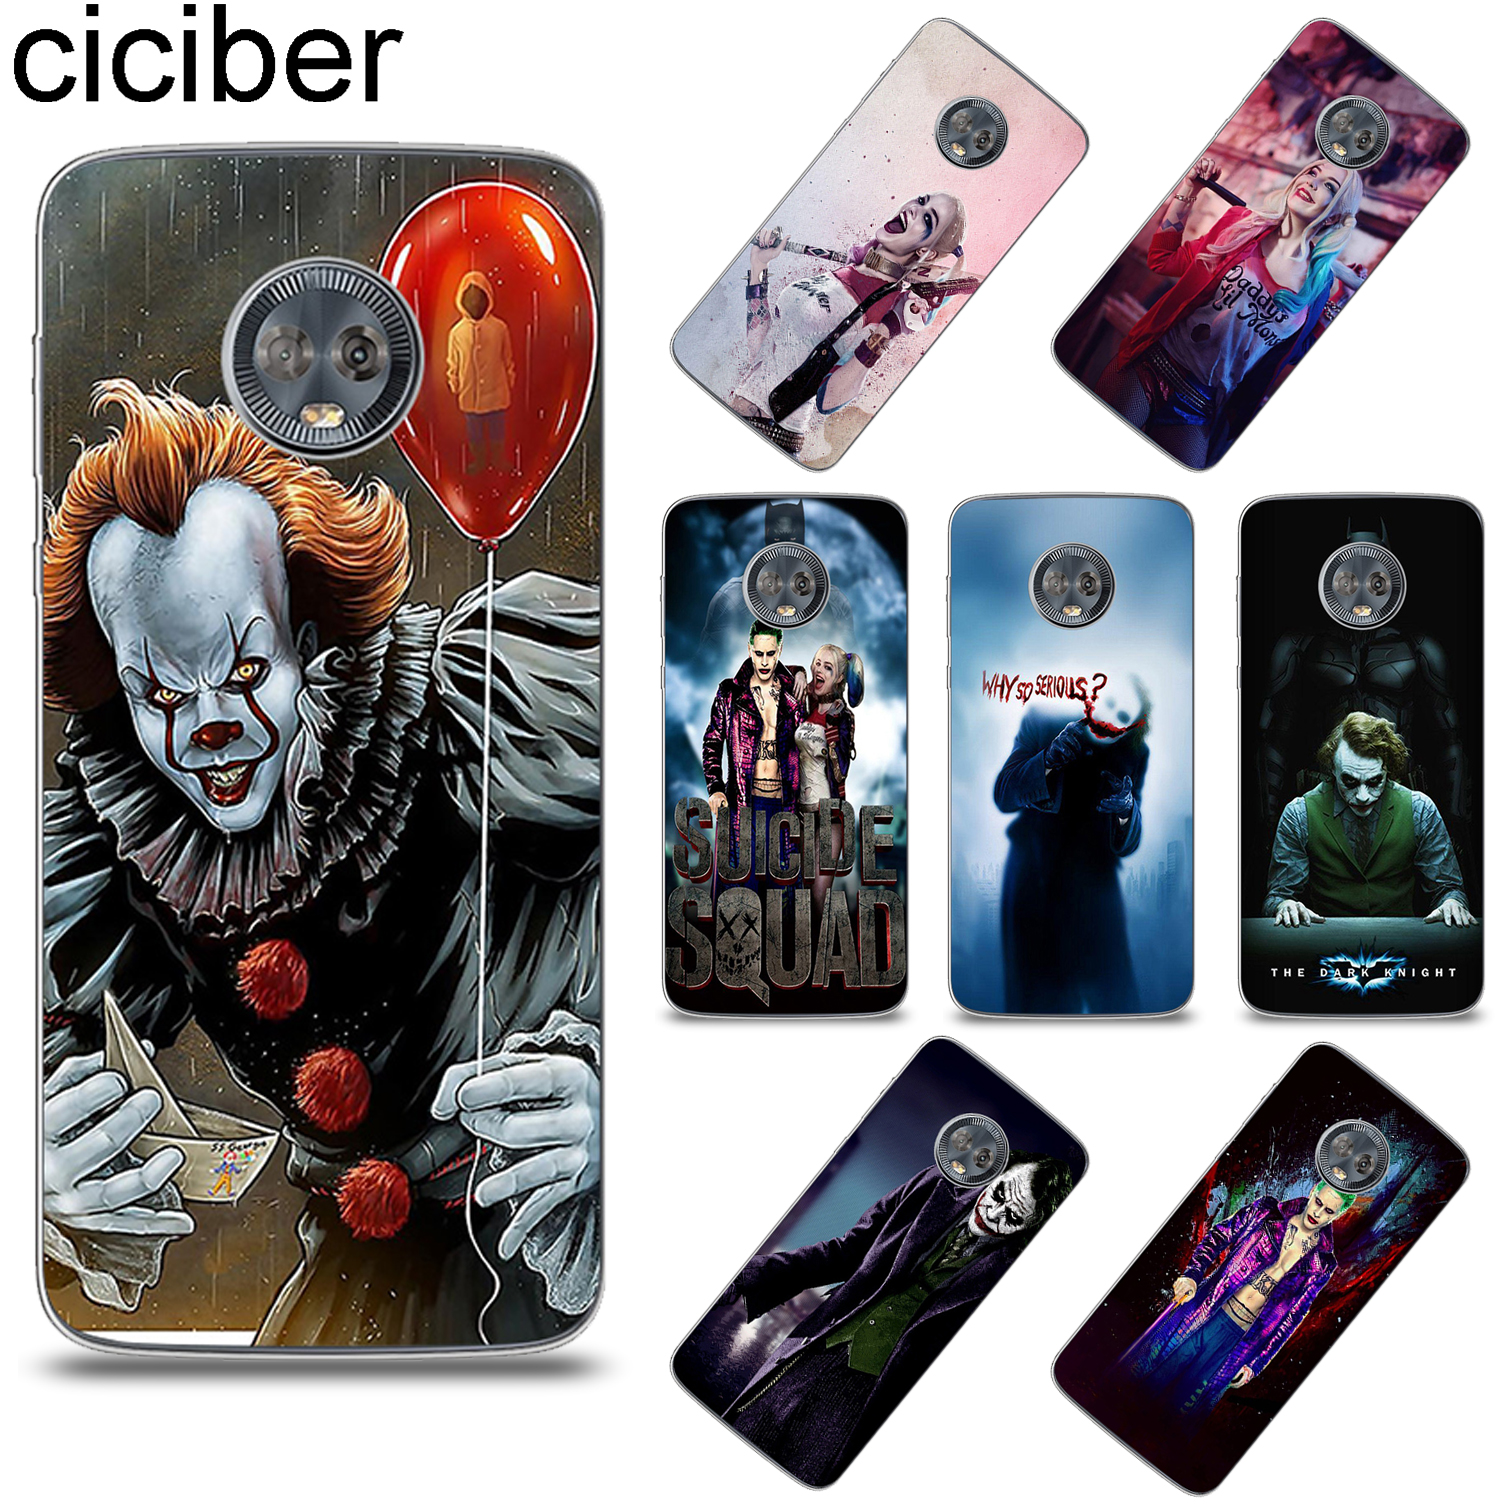 Suicide Squad Joker For Motorola Moto G6 G5 G5S E5 E4 C Z2 Z3 ONE P30 G4 Plus Play Power M X4 Soft TPU Phone Case Coque